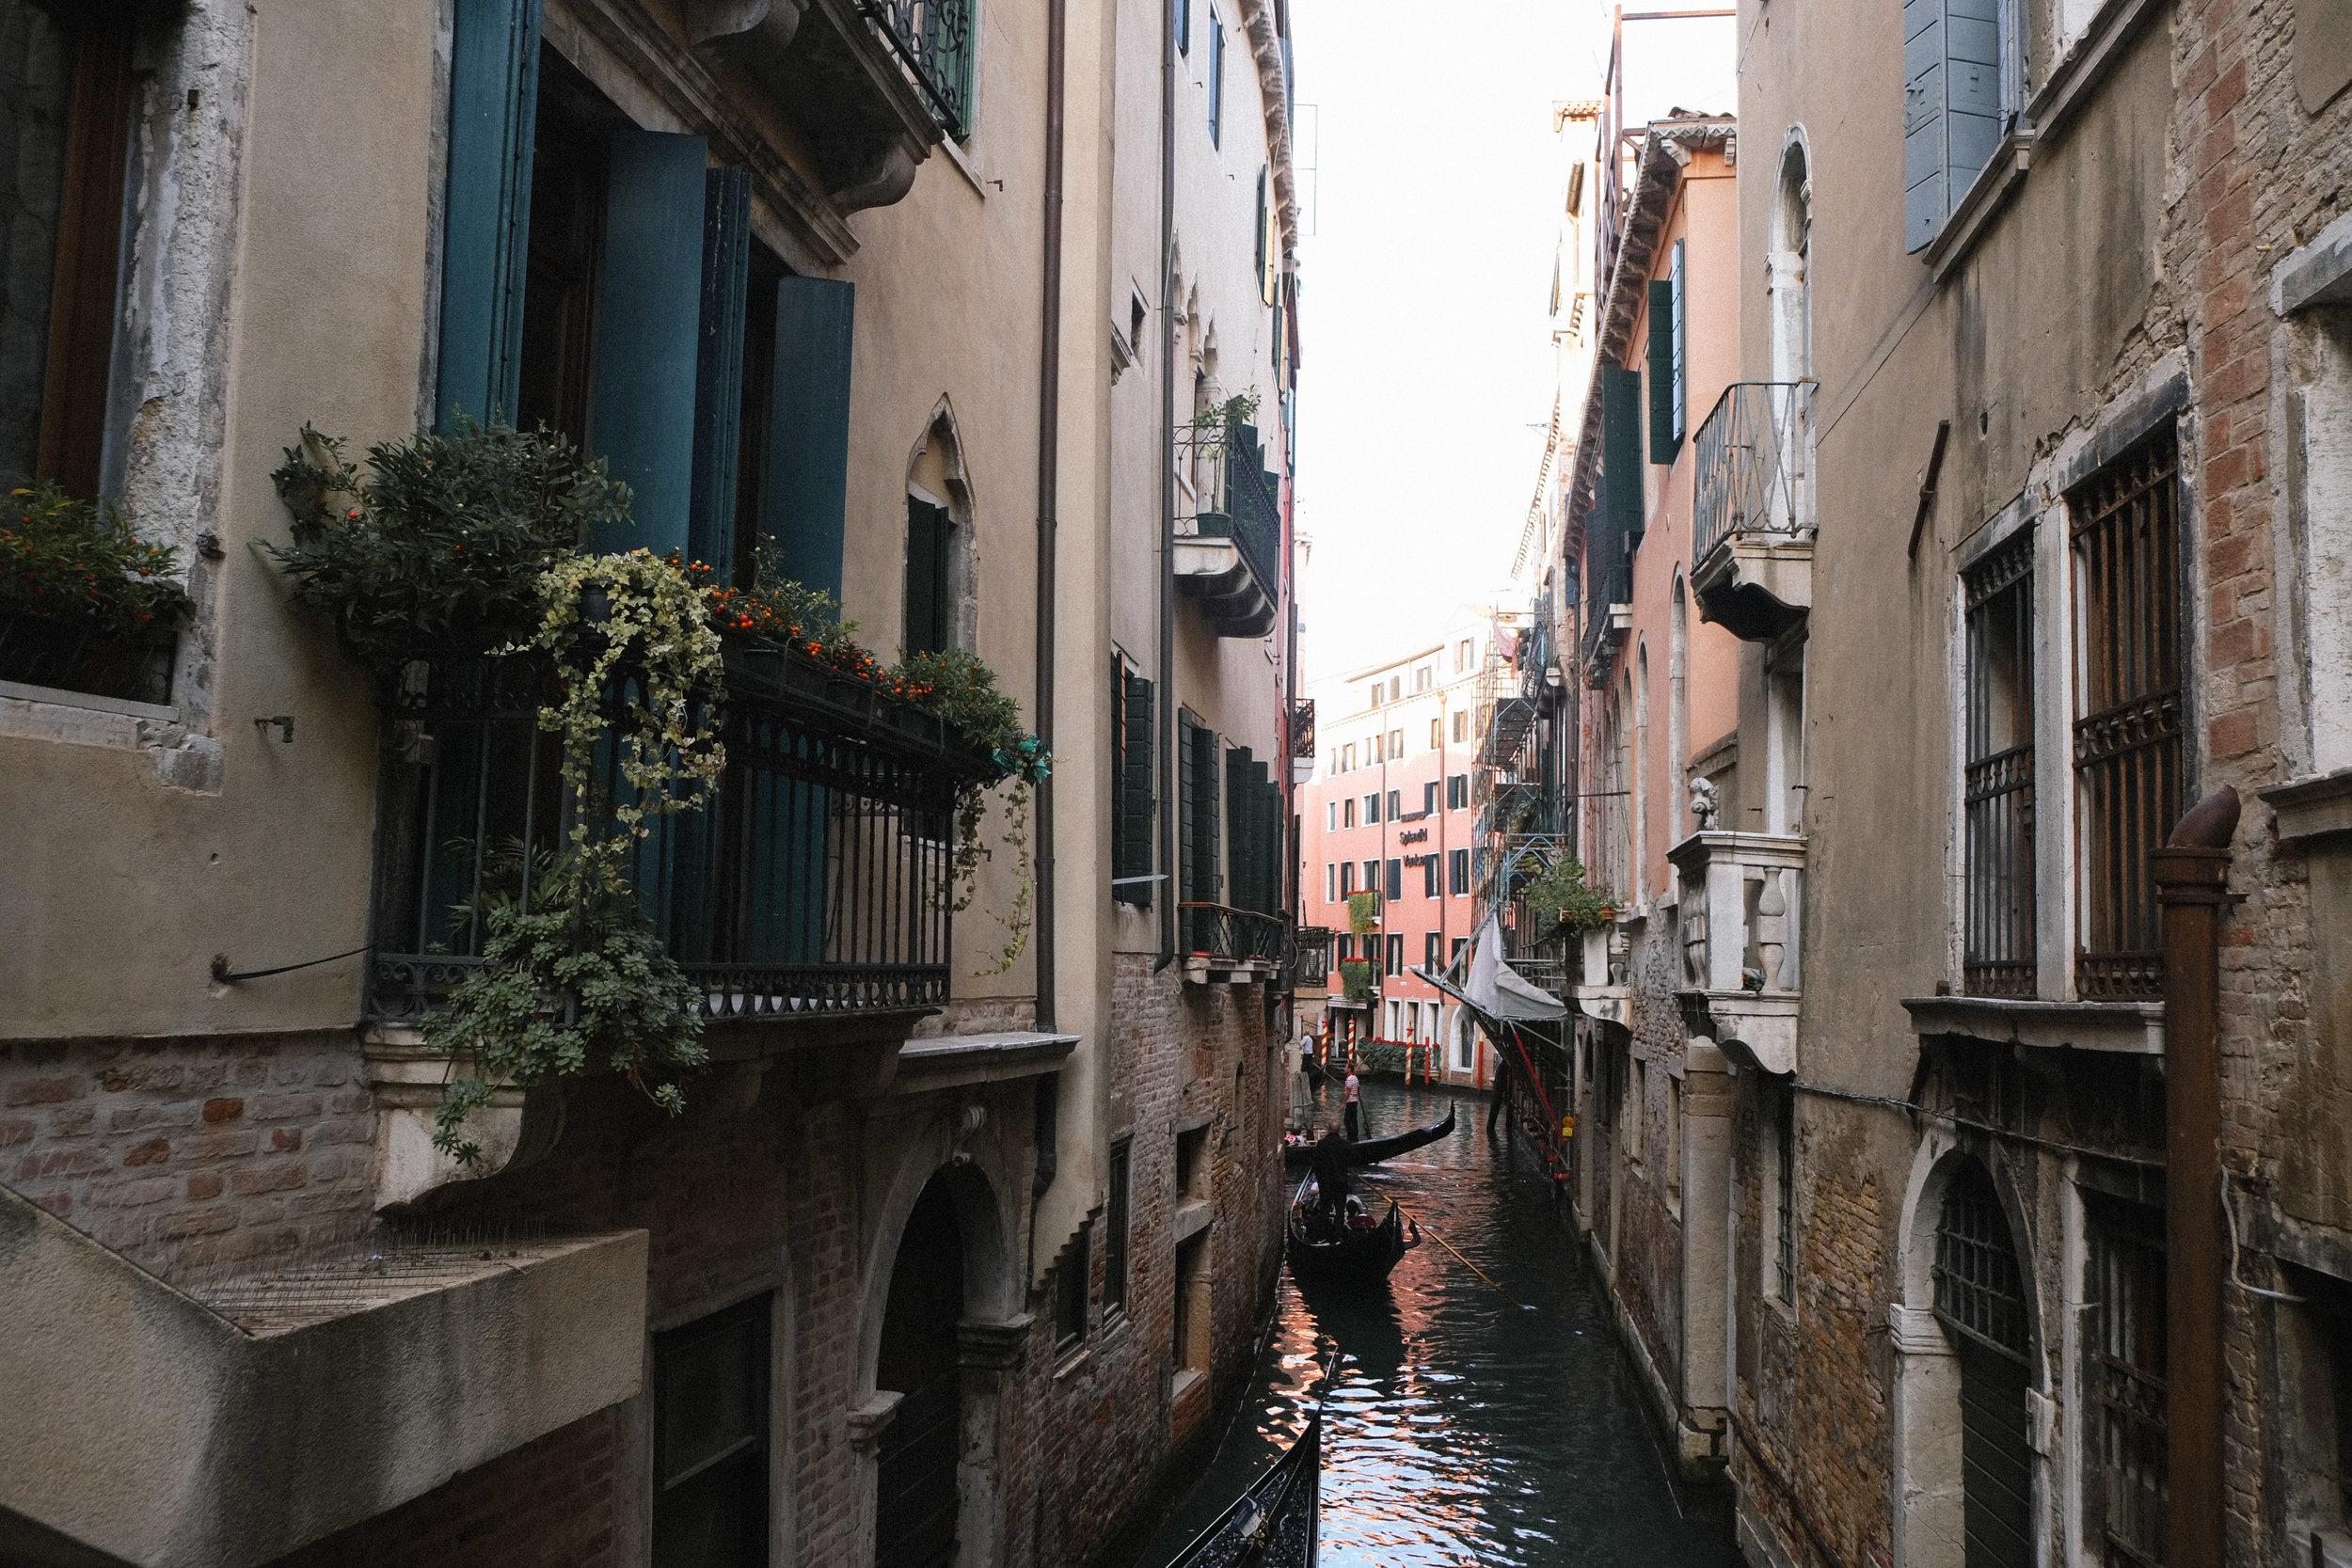 Lesly Lotha_Venice_Italy 01.jpg